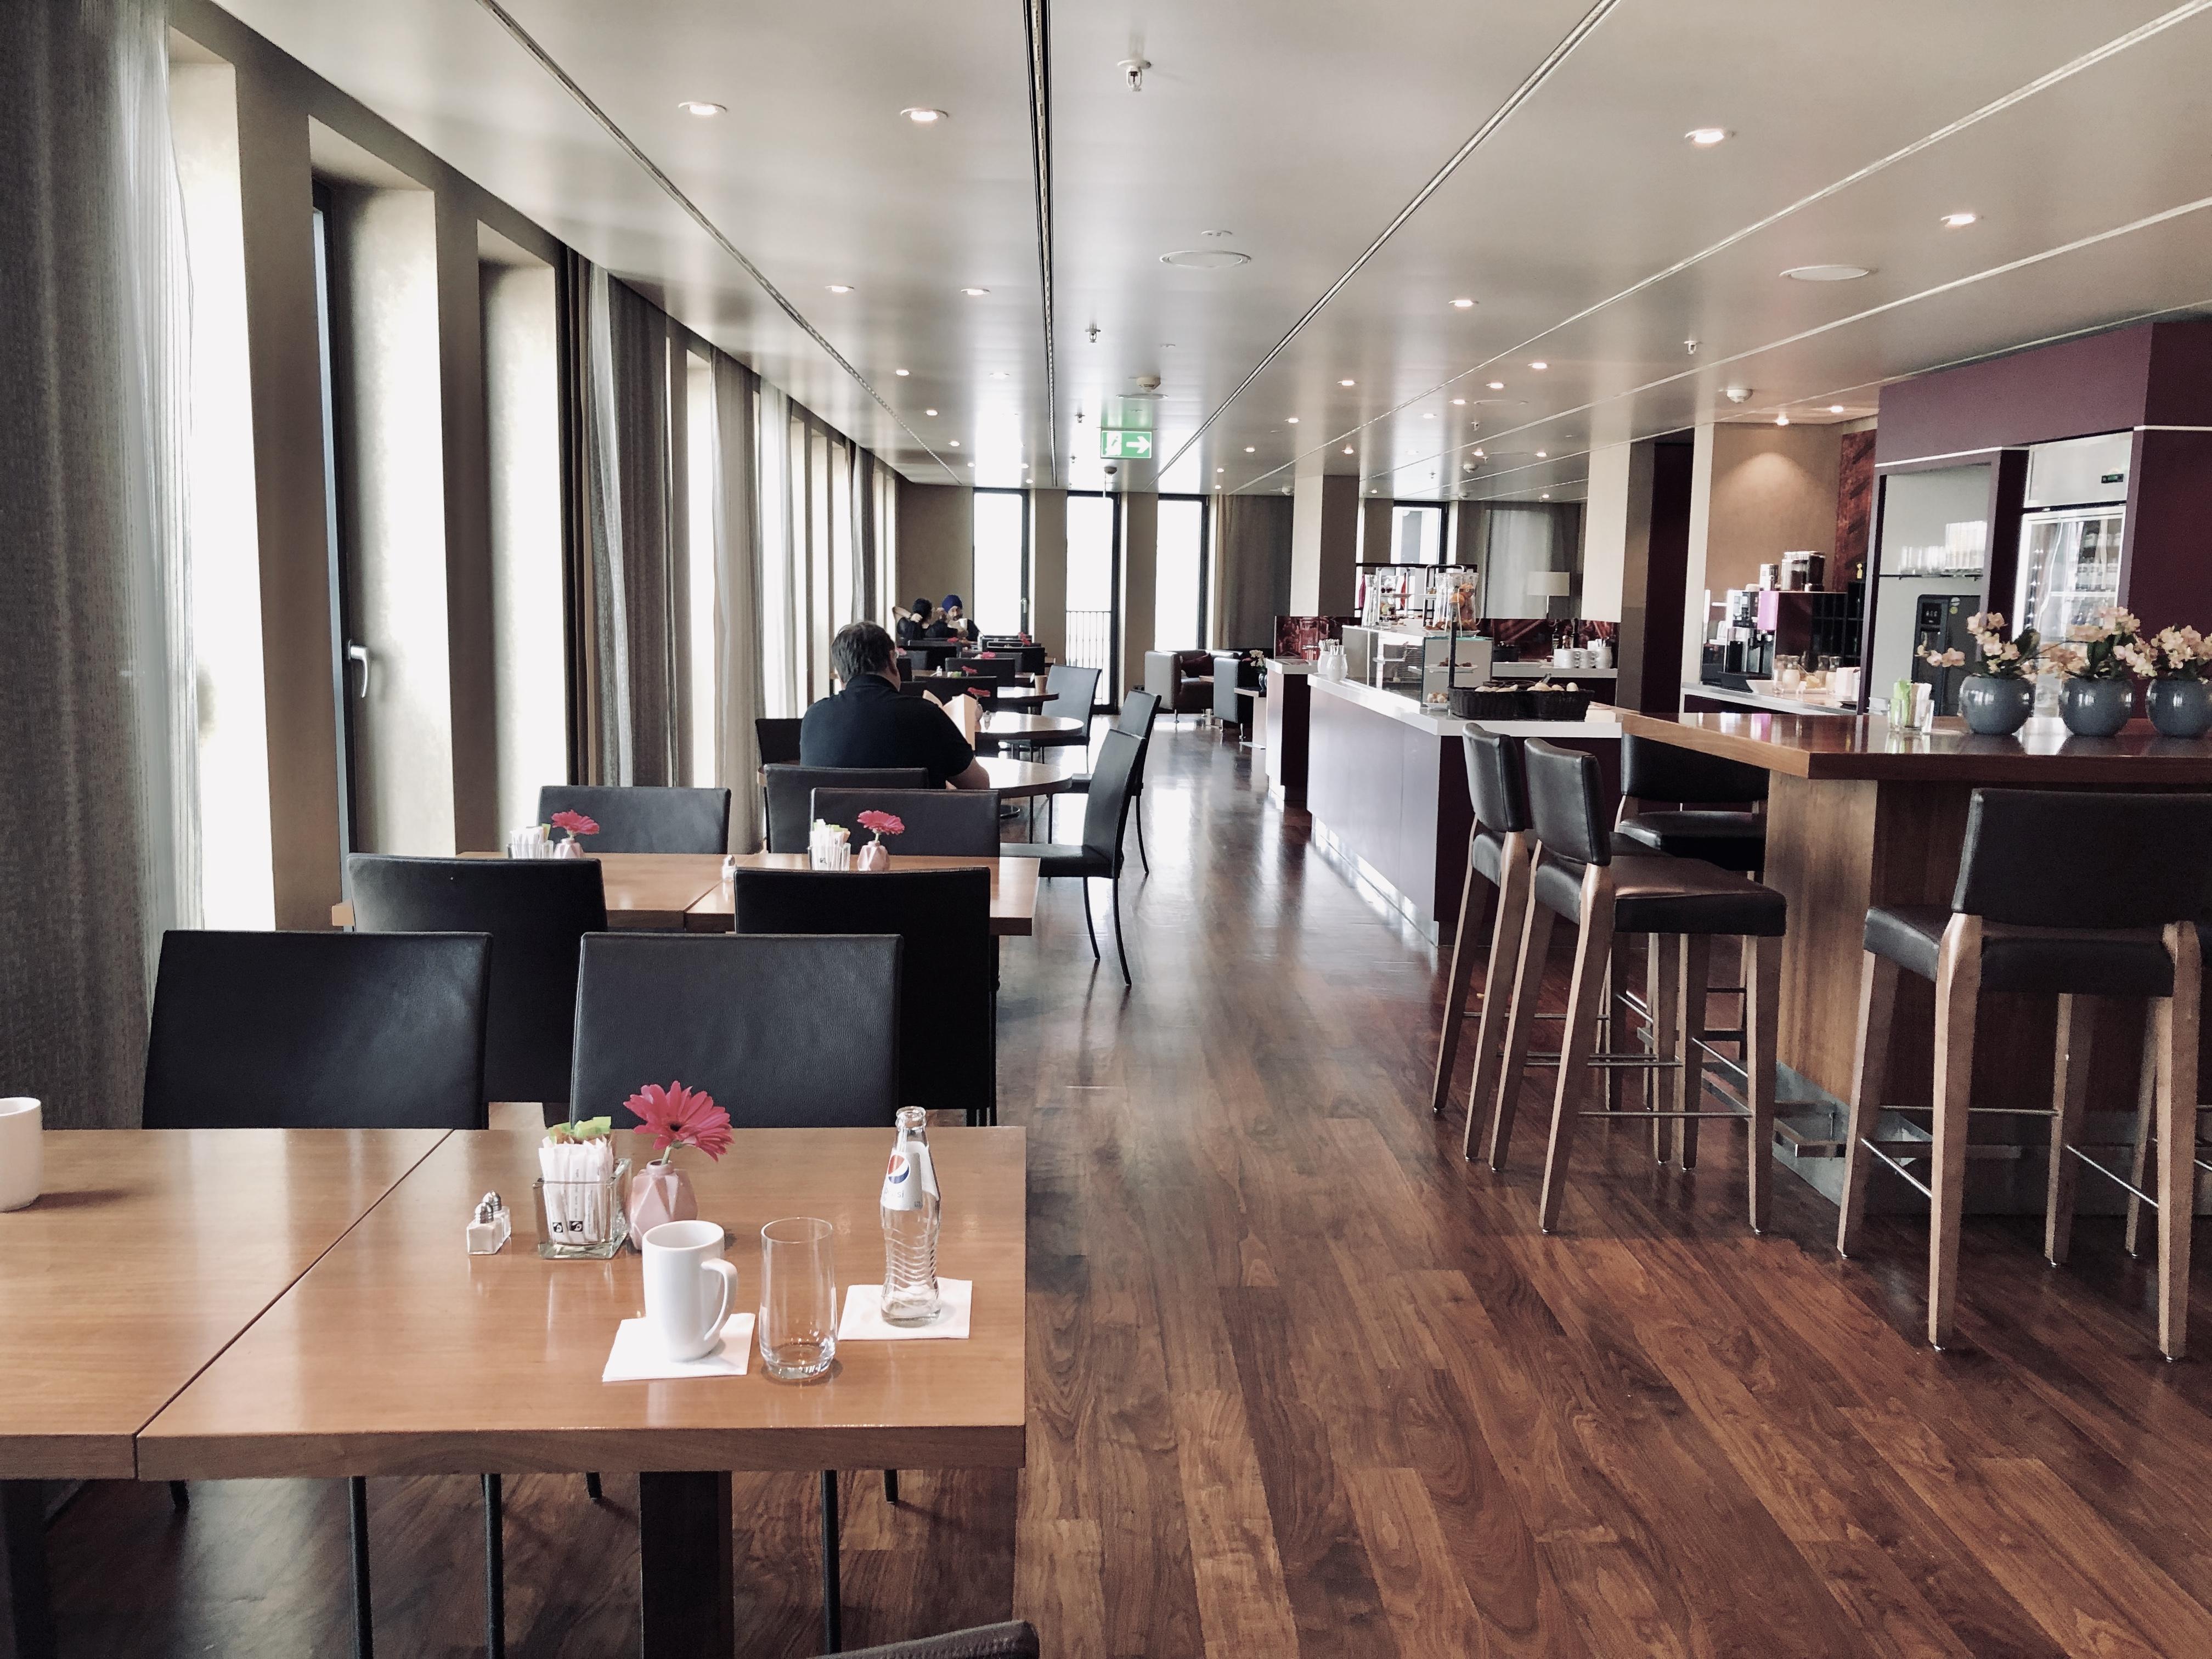 Berlin Marriott Hotel Executive Lounge